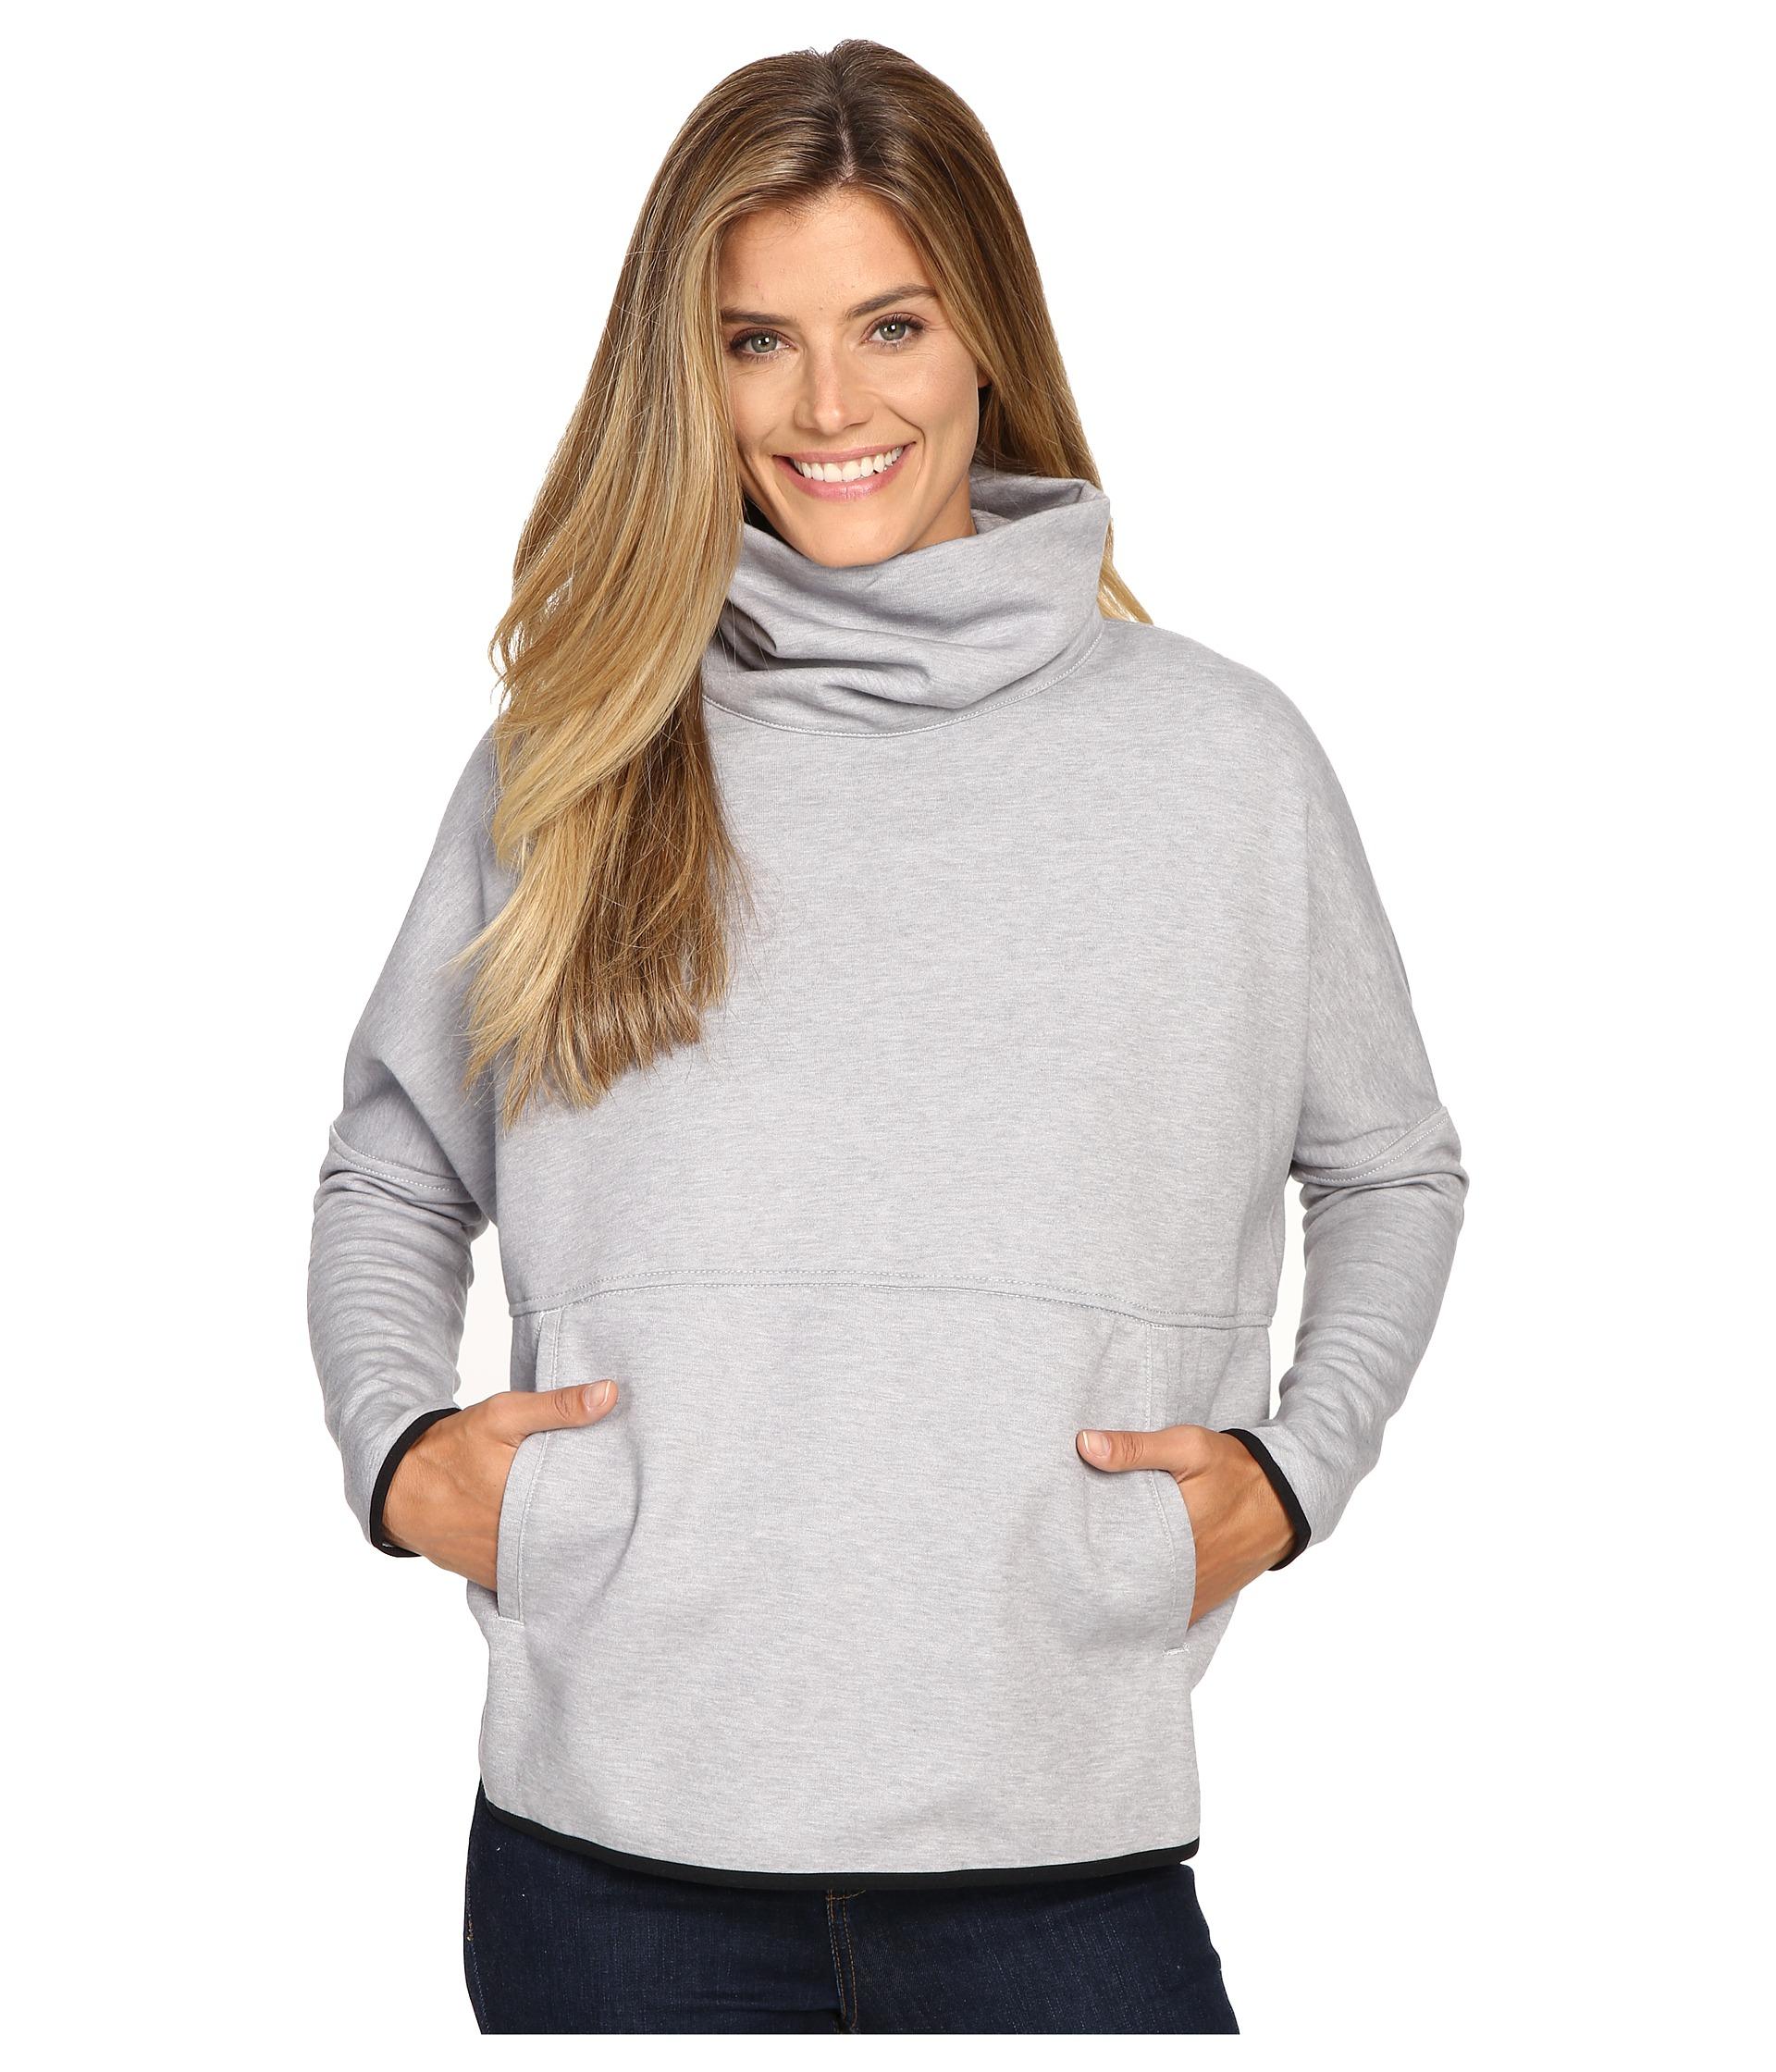 b25b84f1c Women's Gray Slacker Poncho